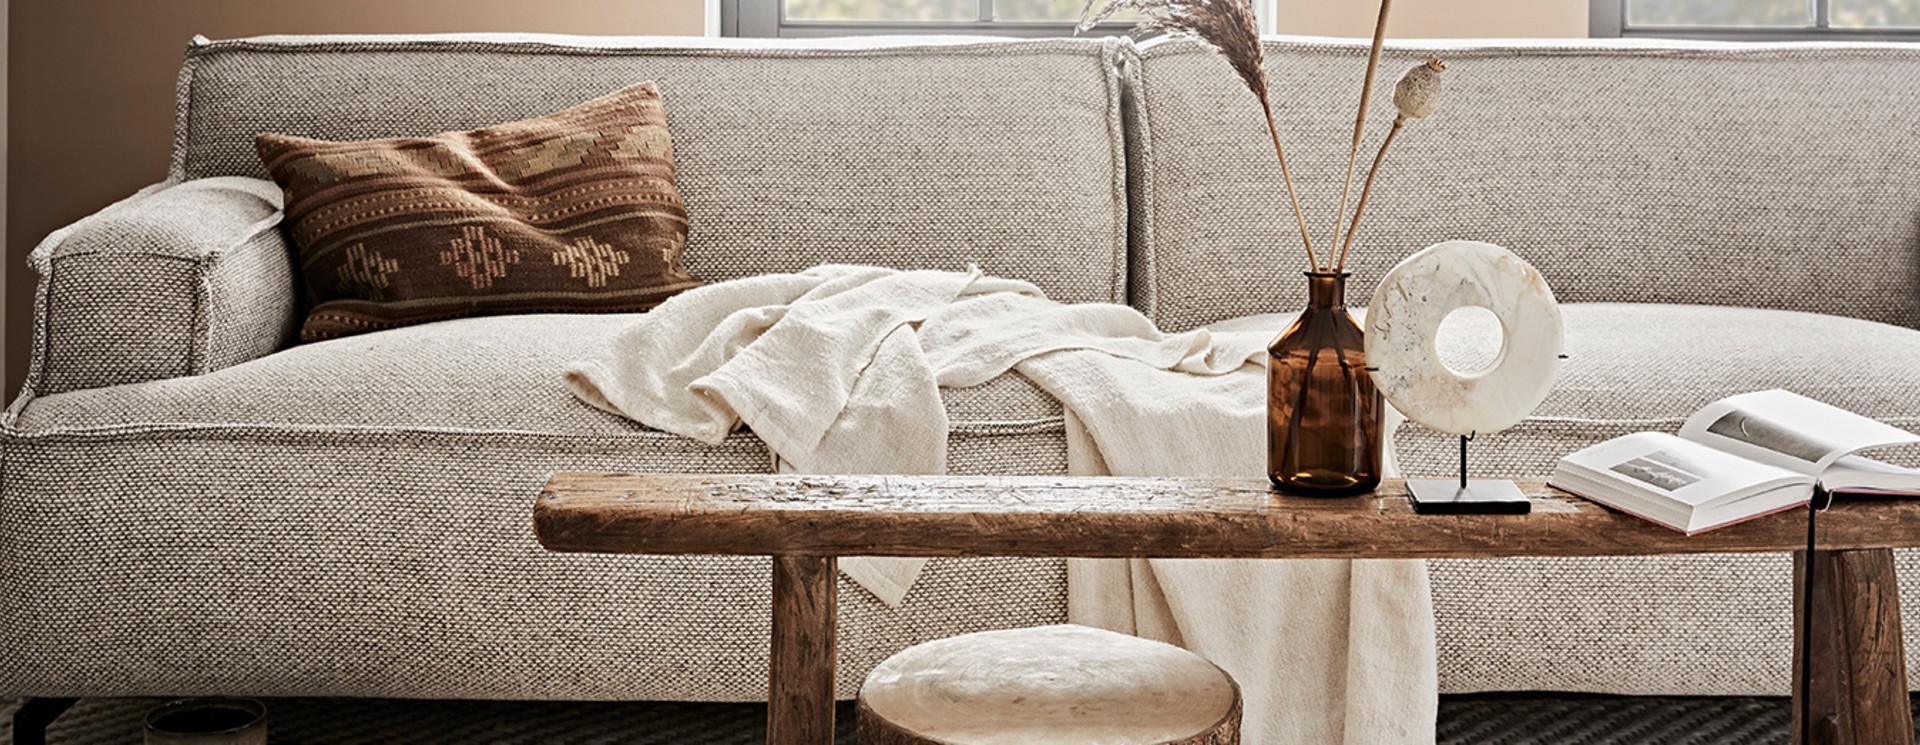 Cosy Barn sofa